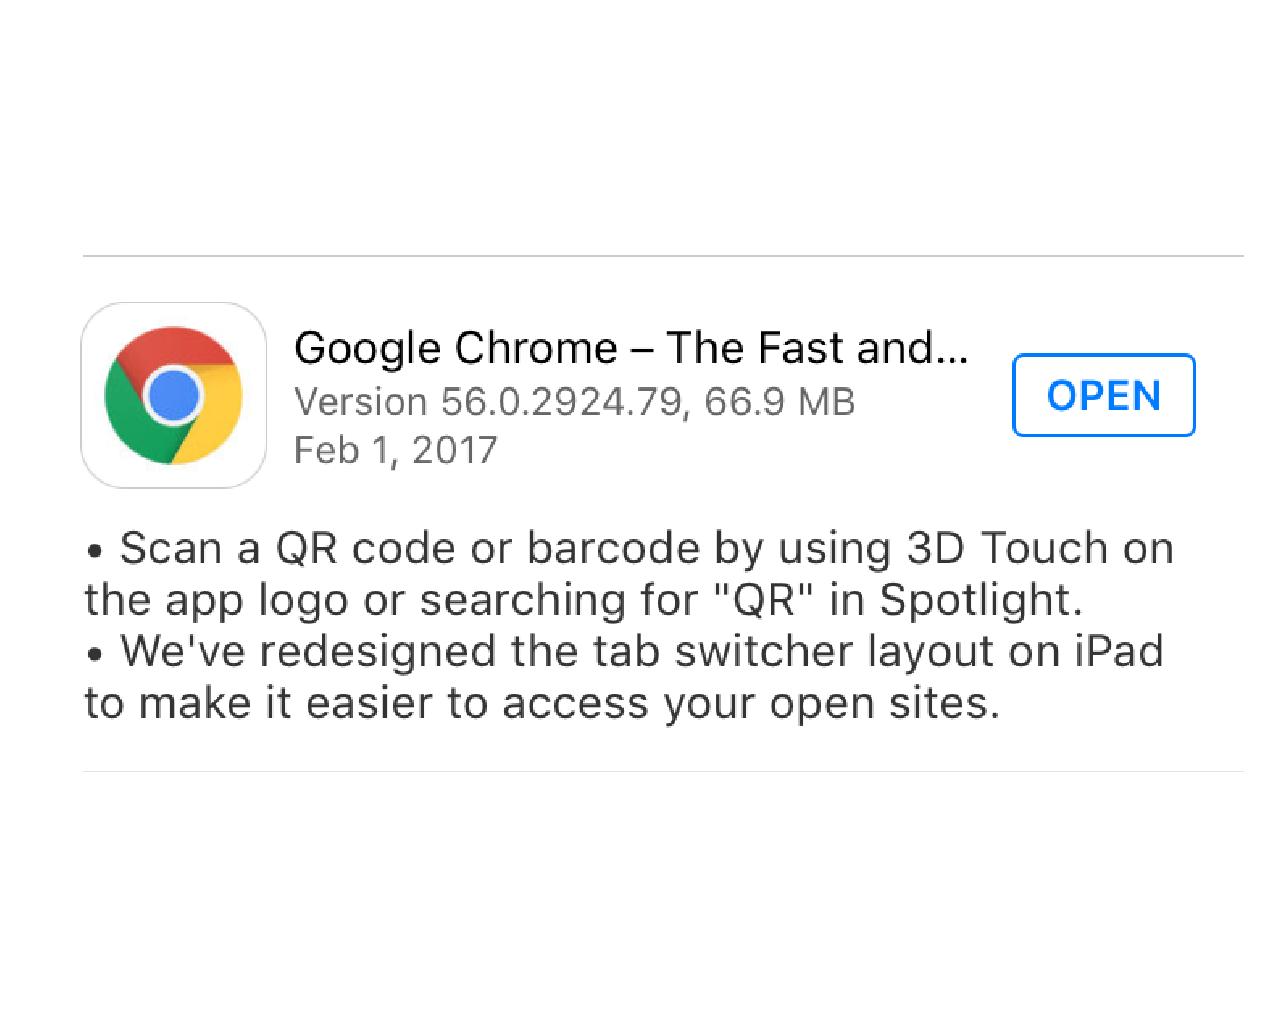 chrome-iphone-app-qr-code-barcode-scan-1